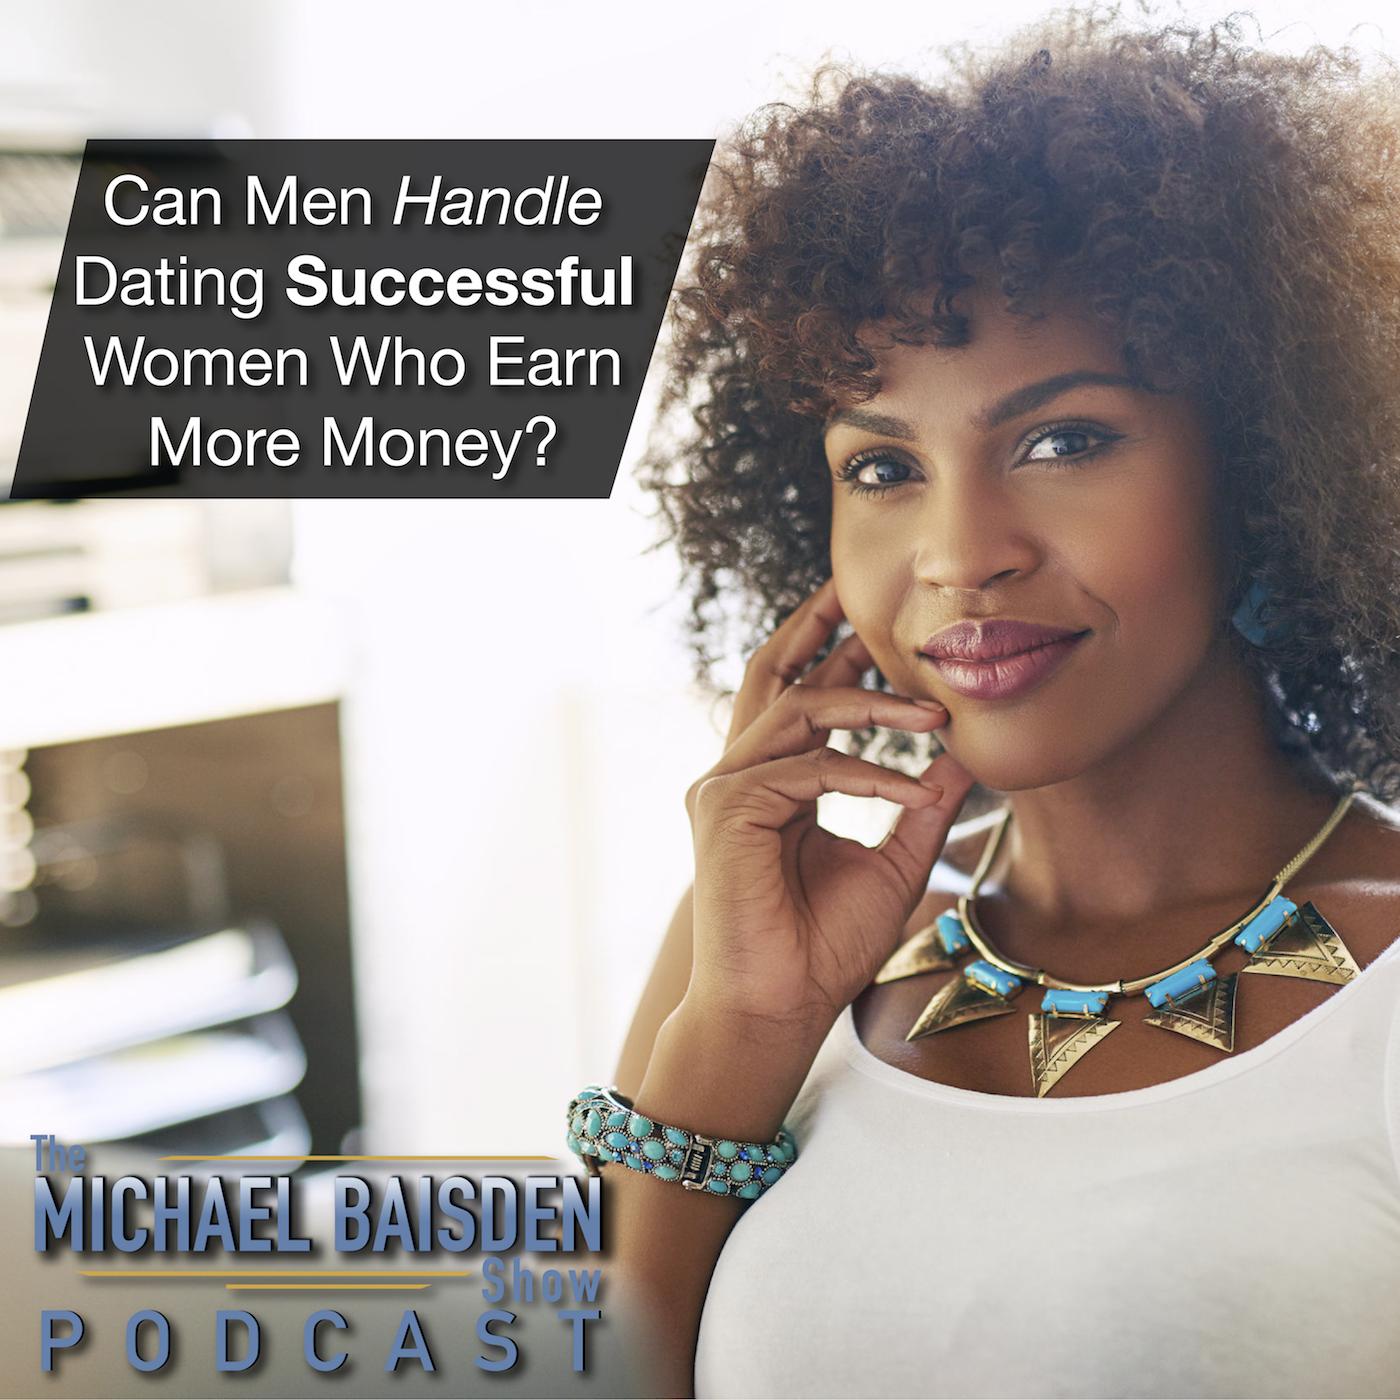 Handle dating